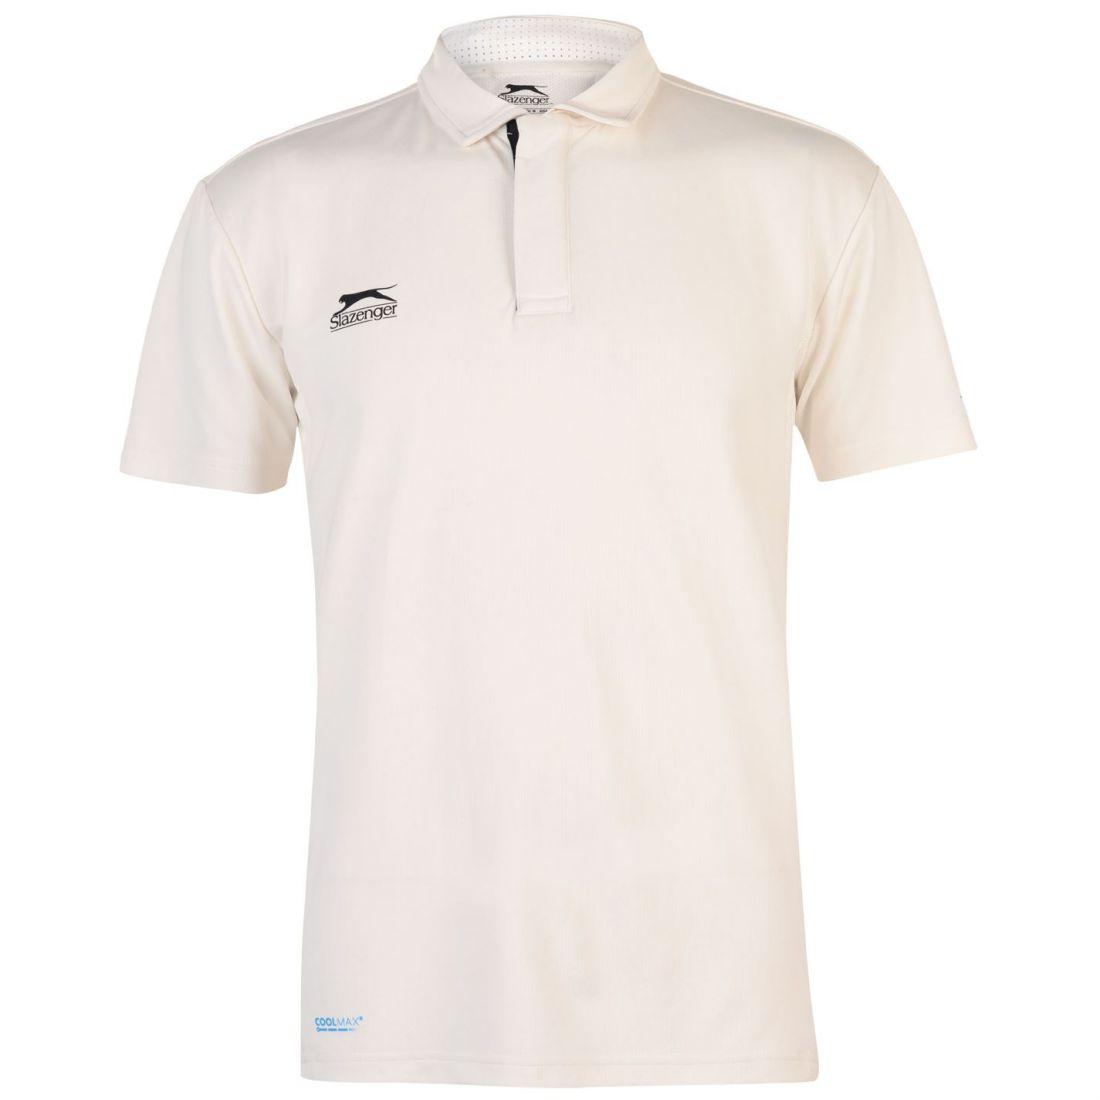 6b0ba3cb Image is loading Slazenger-Mens-Aero-Cricket-Shirt-Short-Sleeve-T-